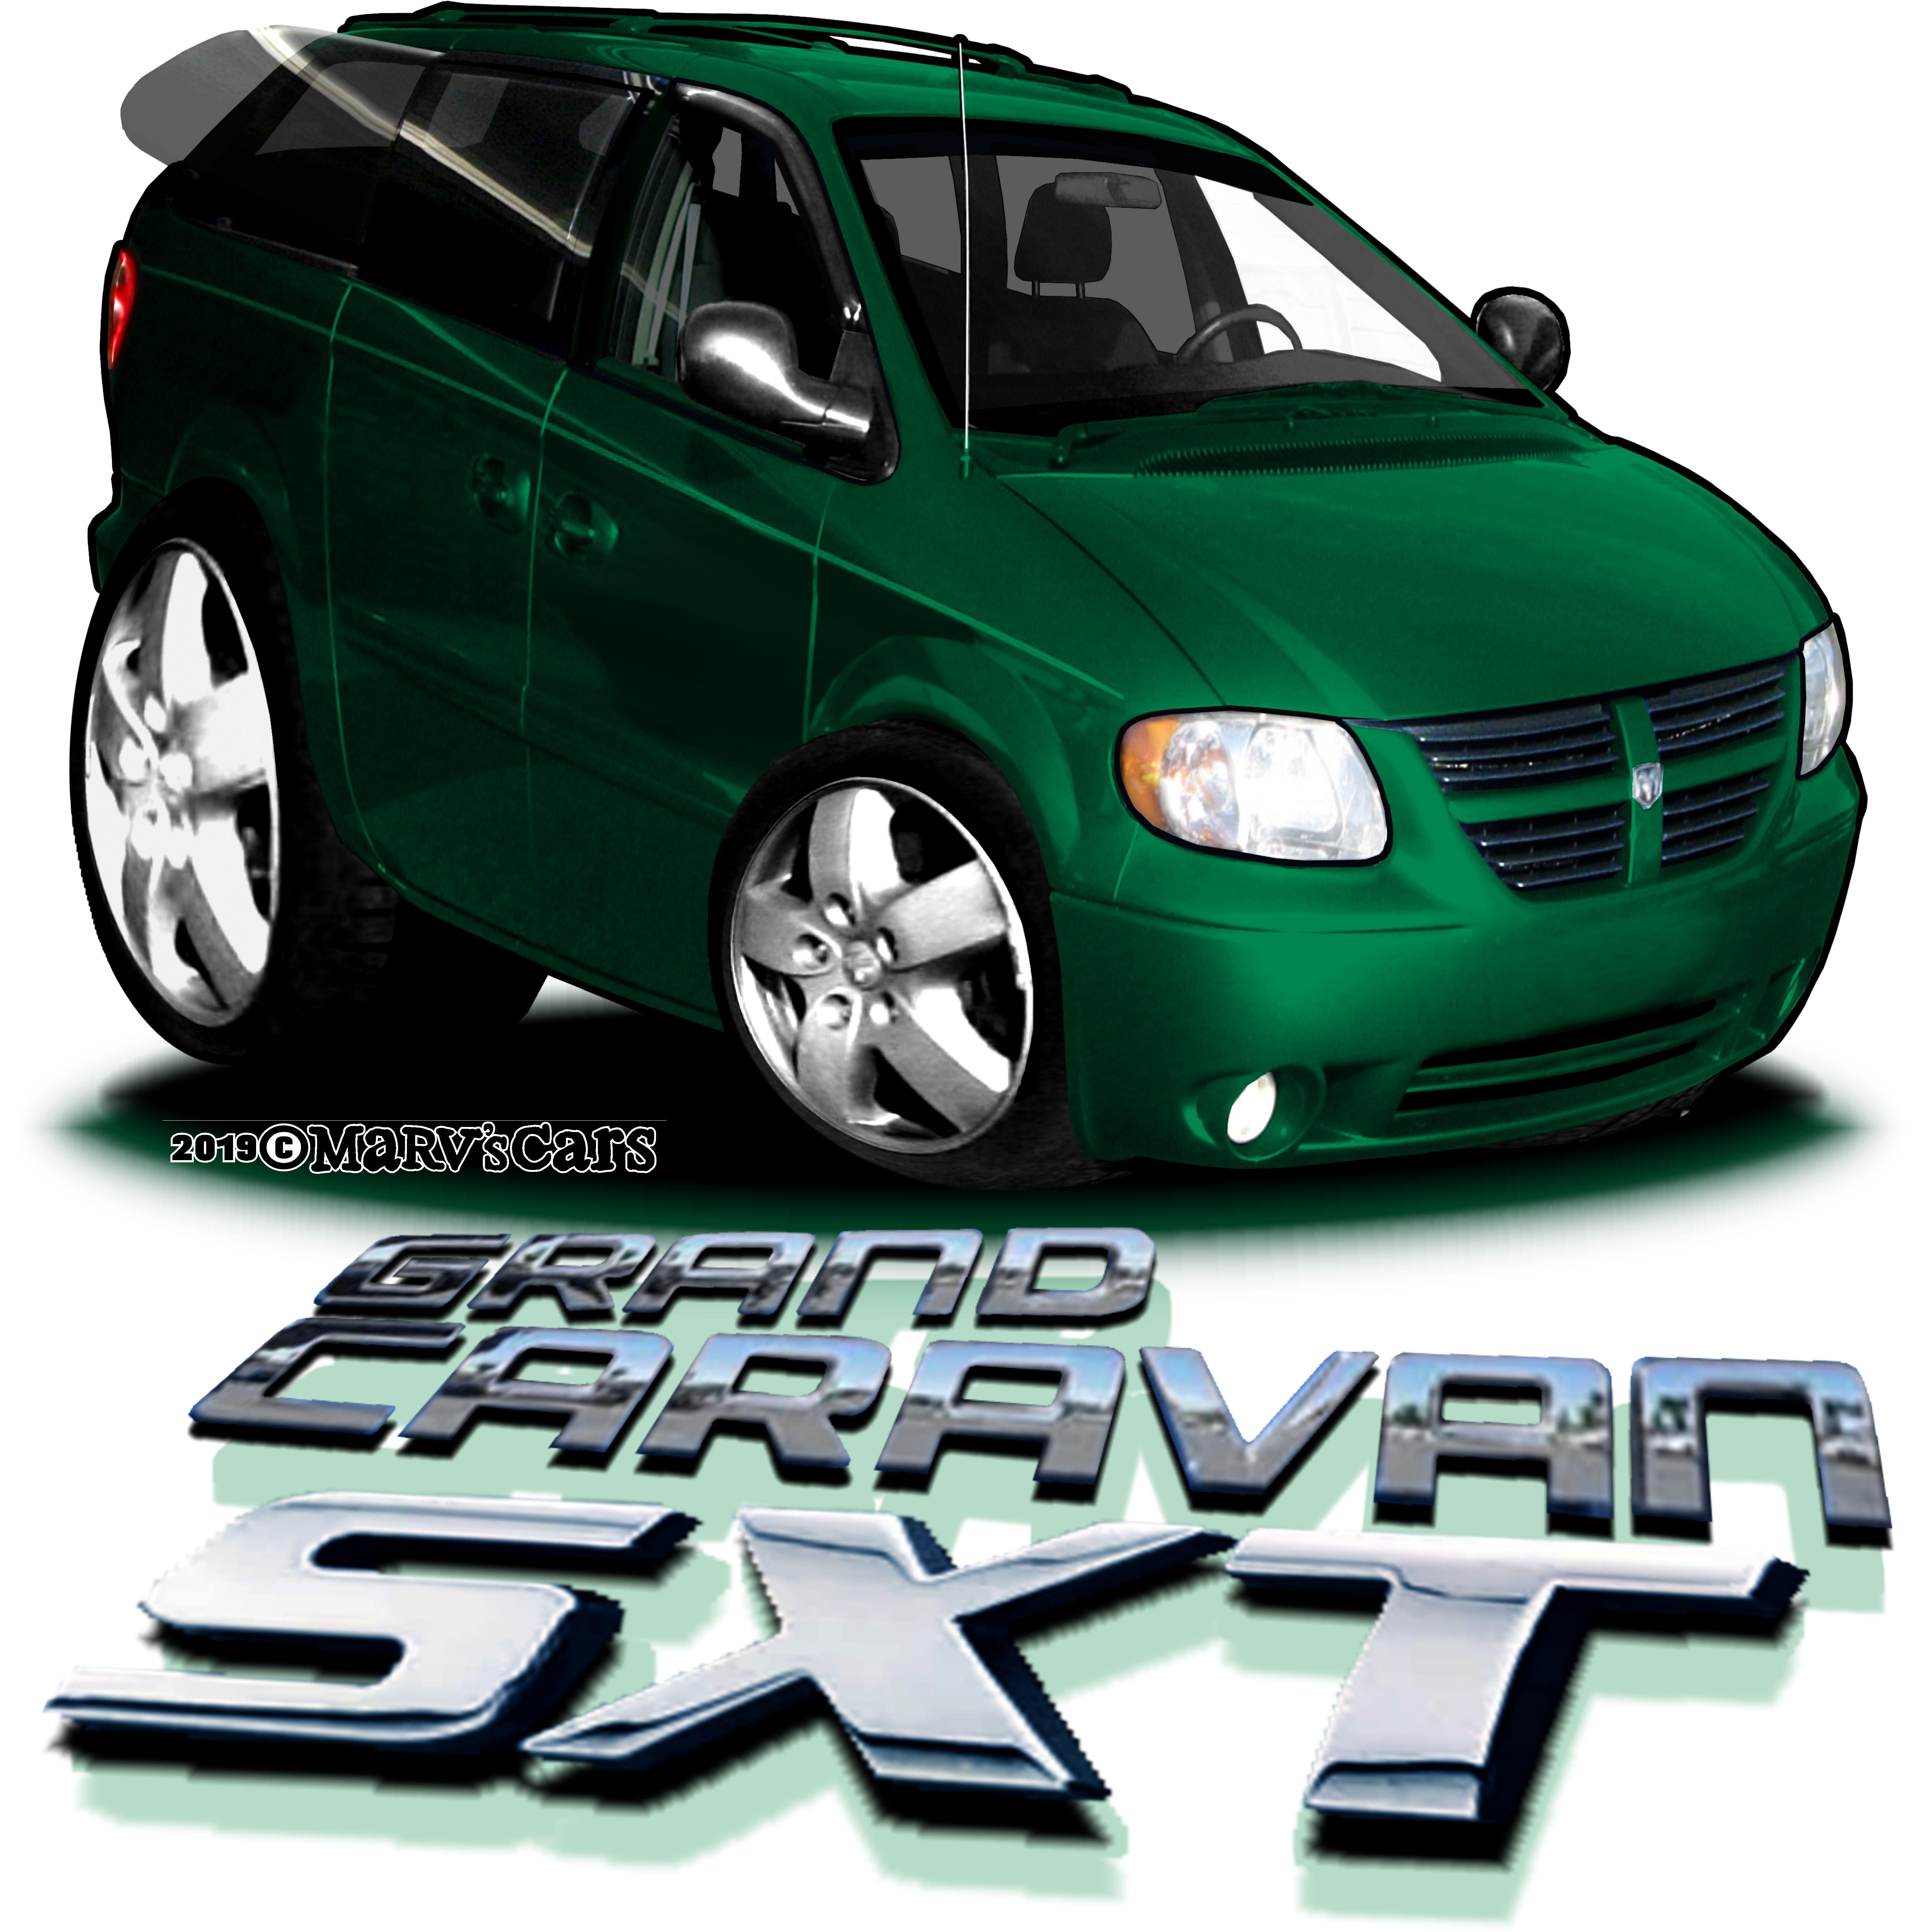 Marvs Cars Grand Caravan Cartoon Style Drawing Cartoon Styles